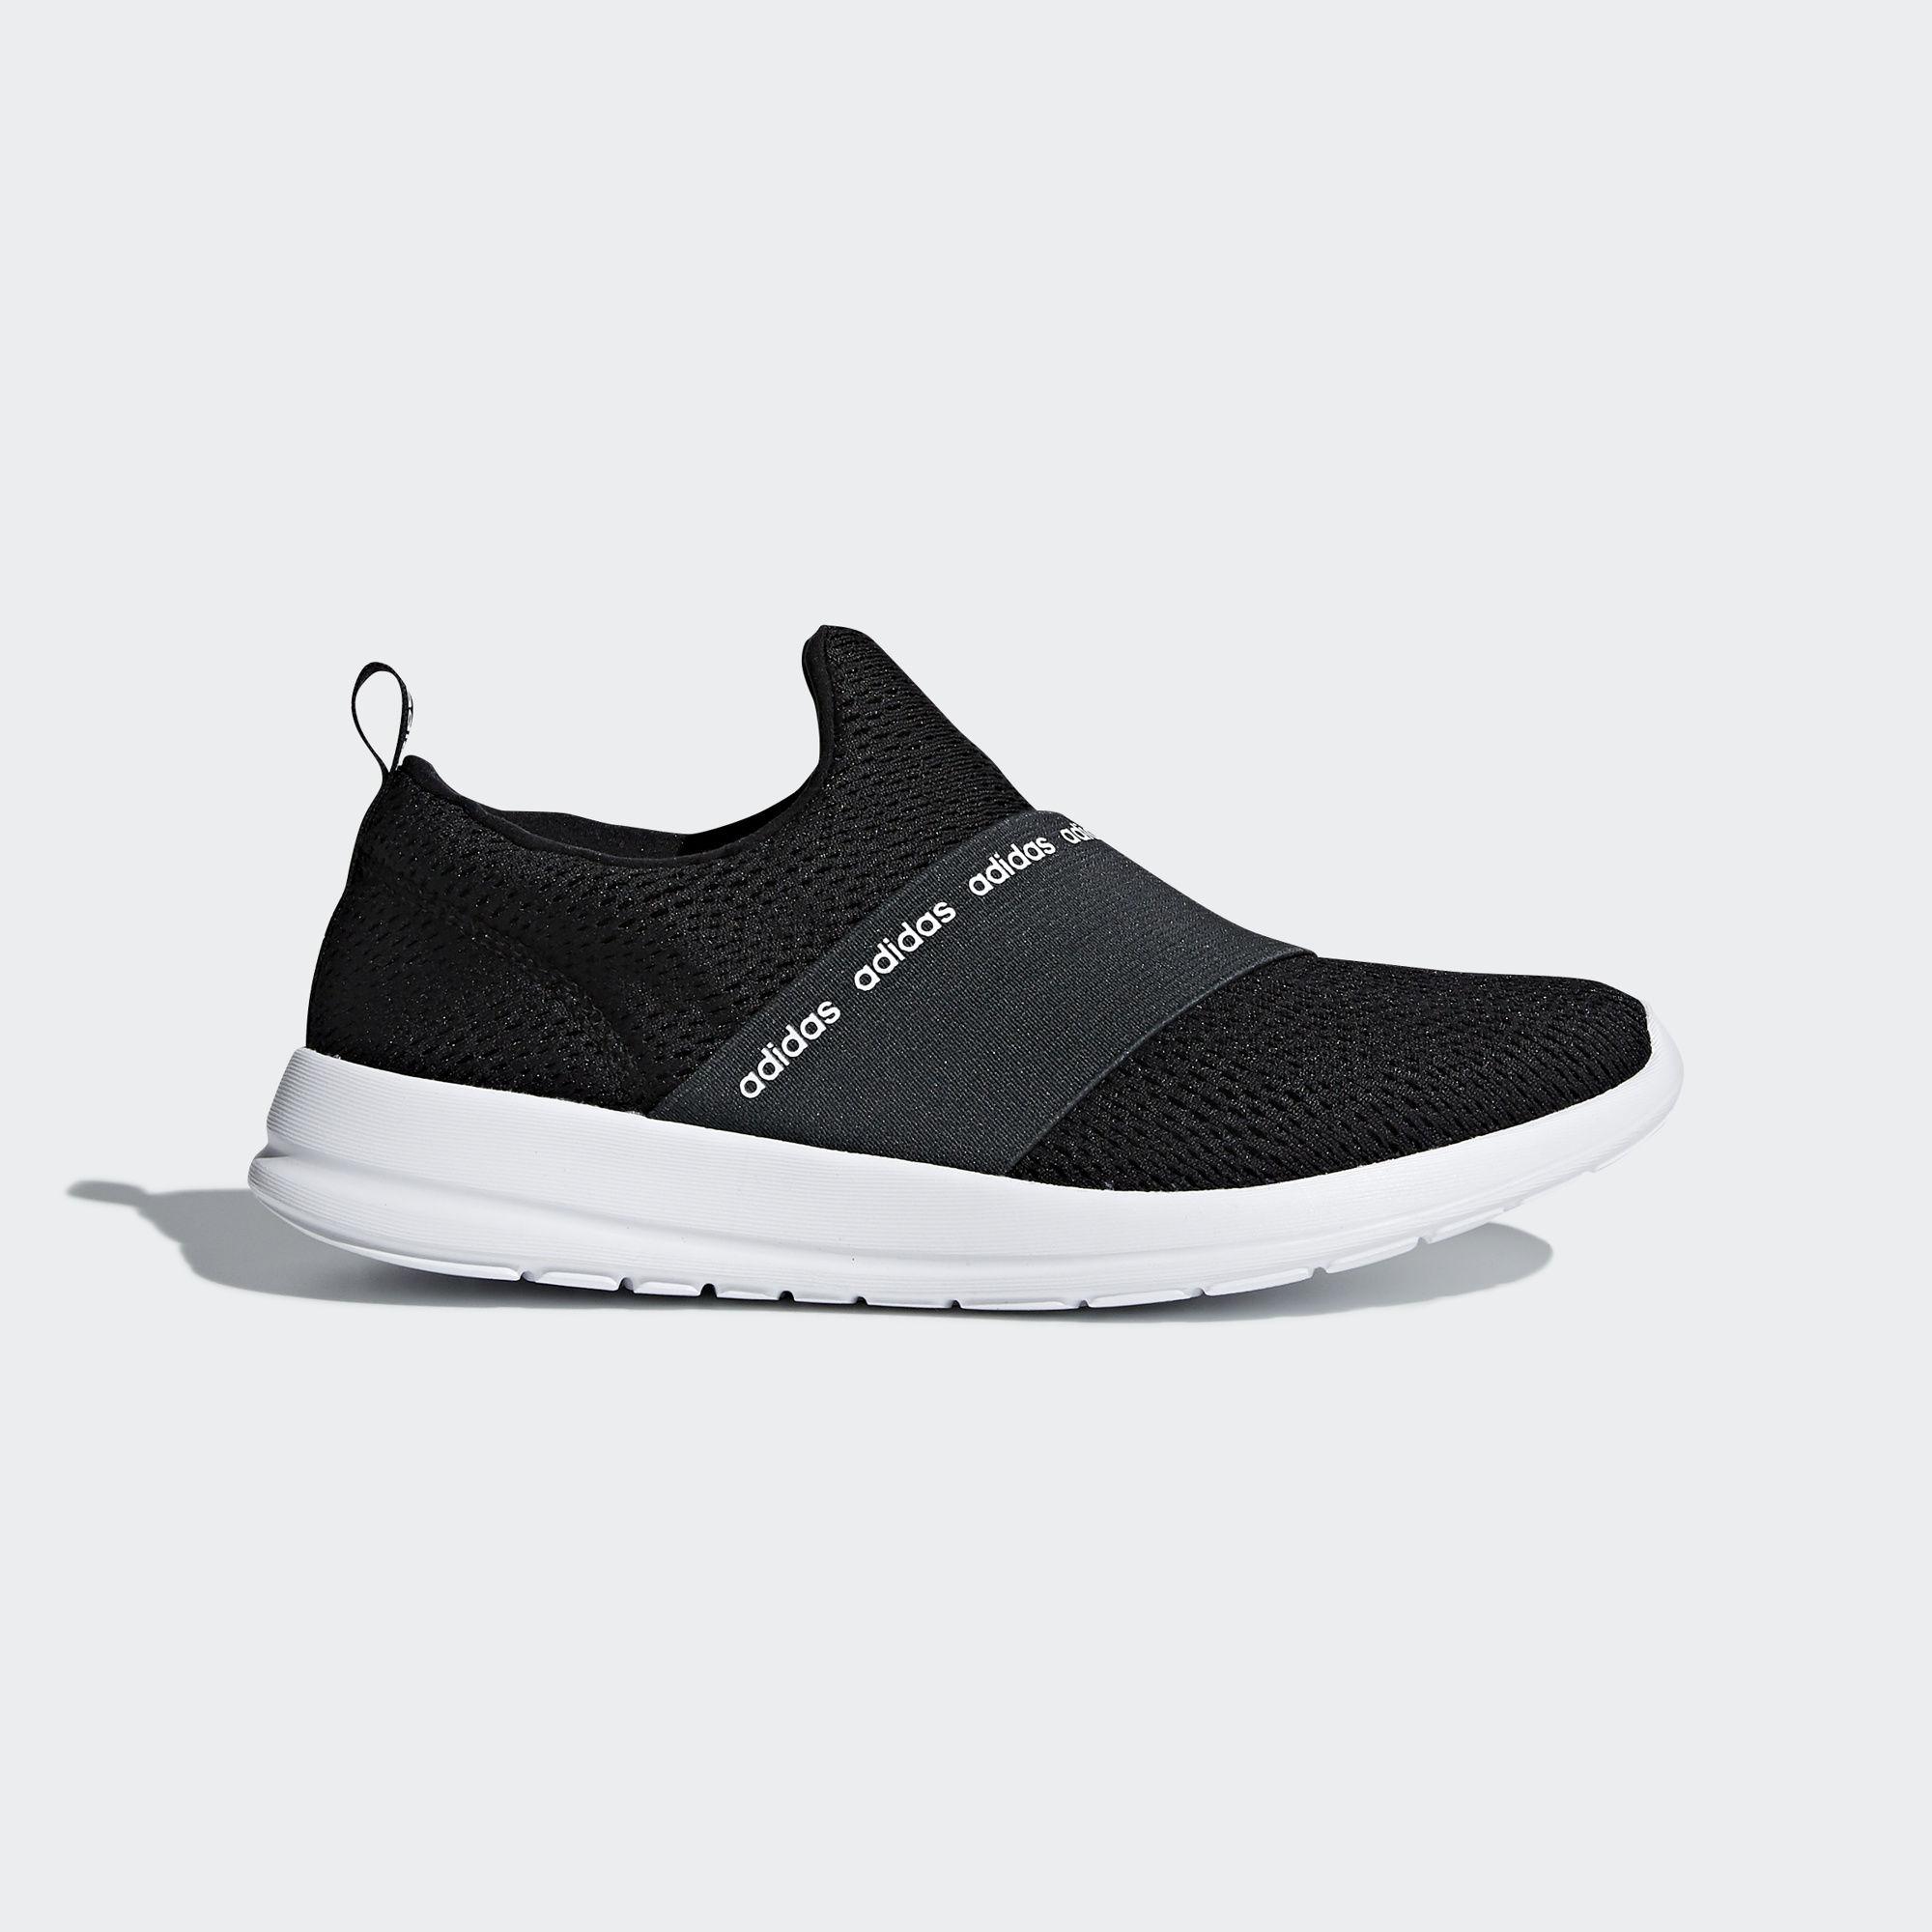 Cloudfoam Refine Adapt Shoes | Upp till 70% |